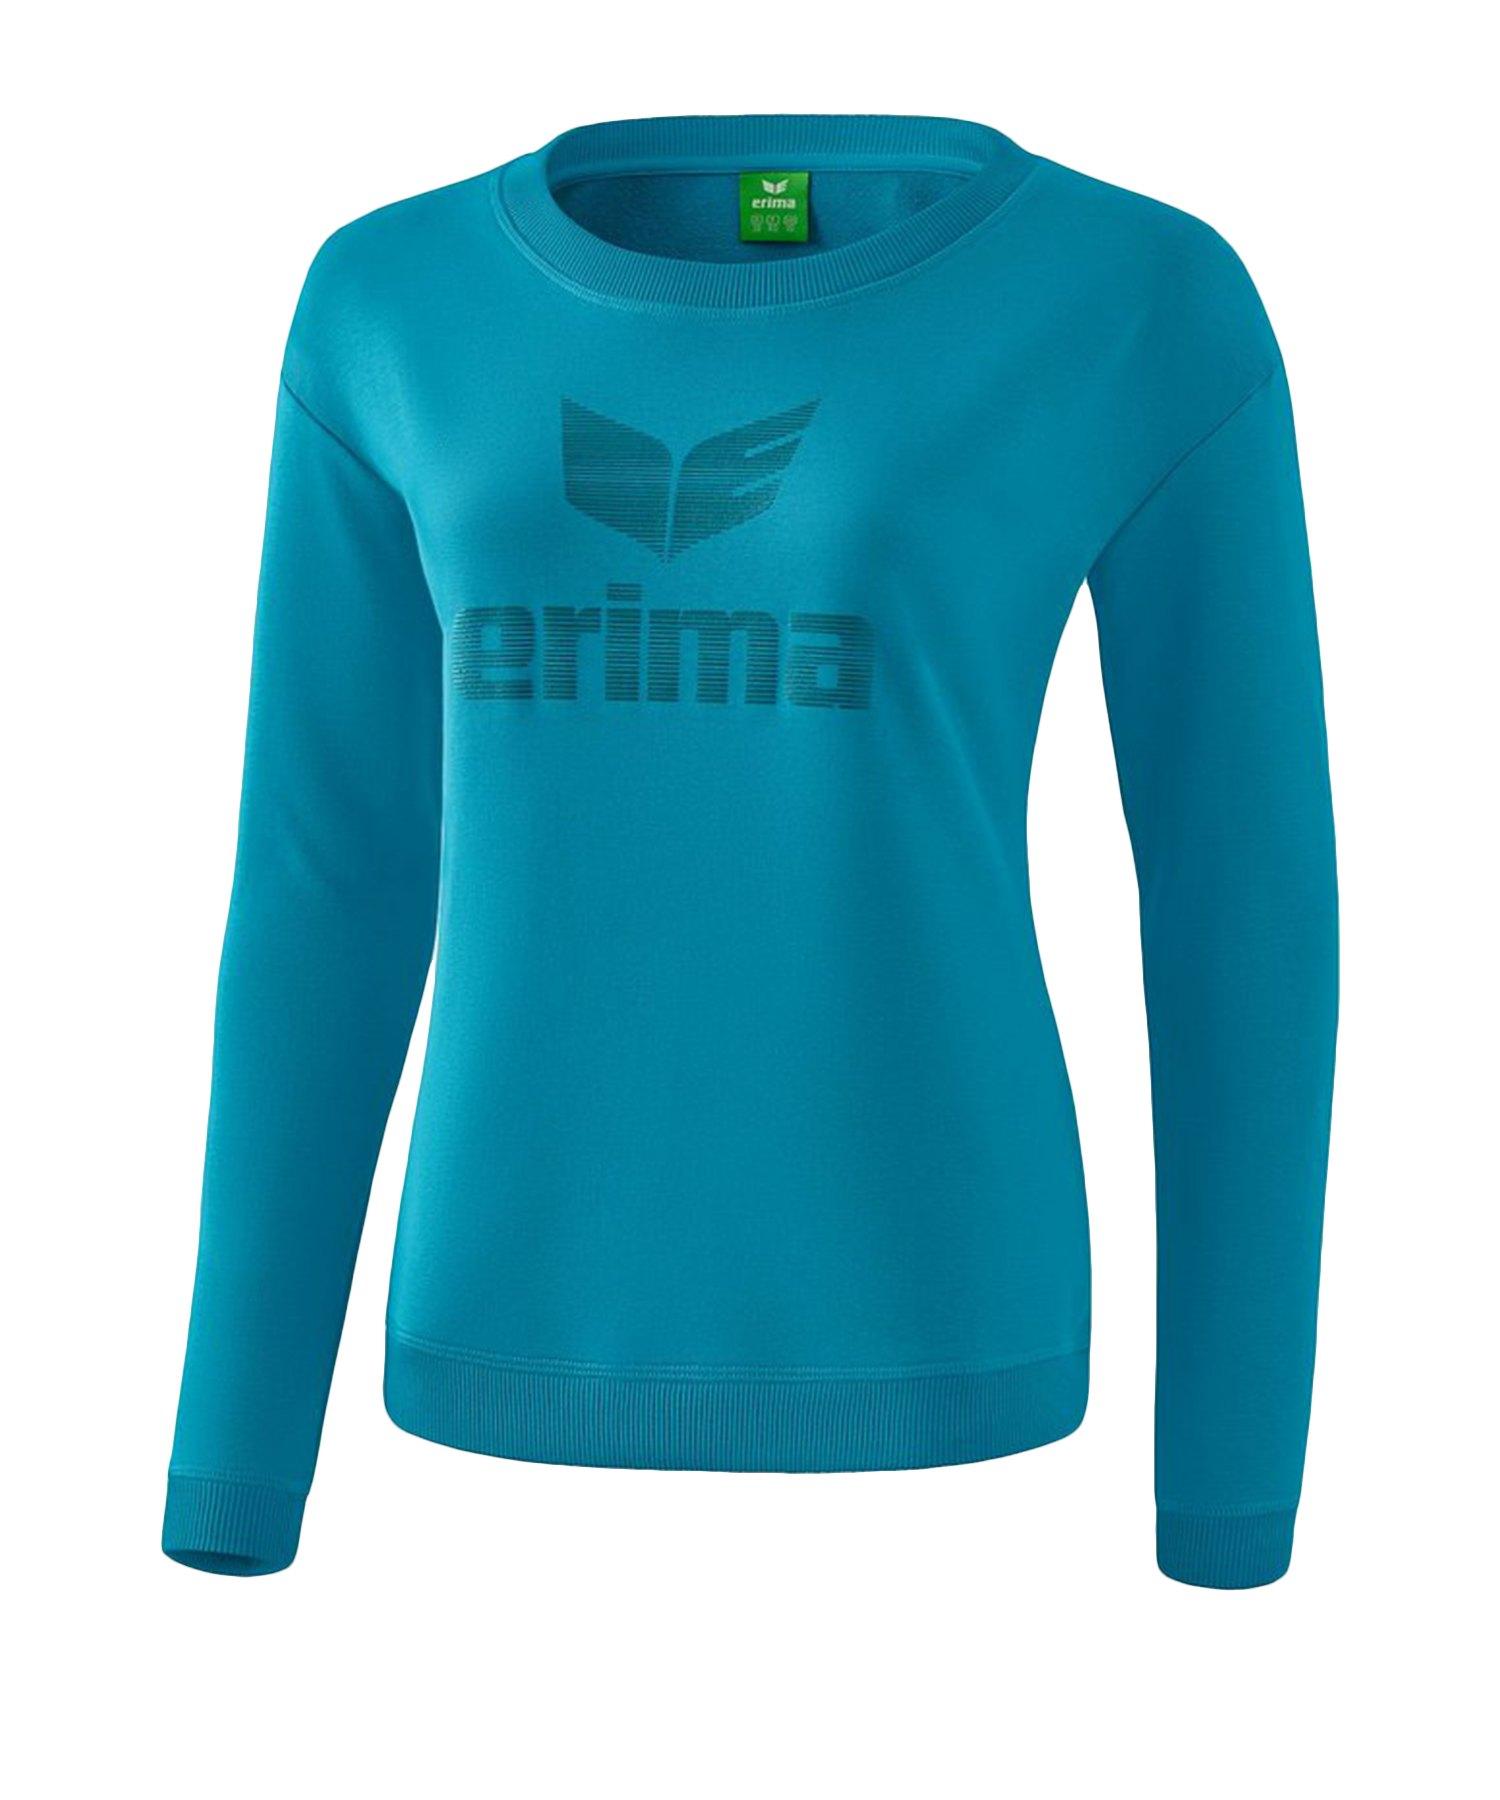 Erima Essential Sweatshirt Damen Blau - Blau